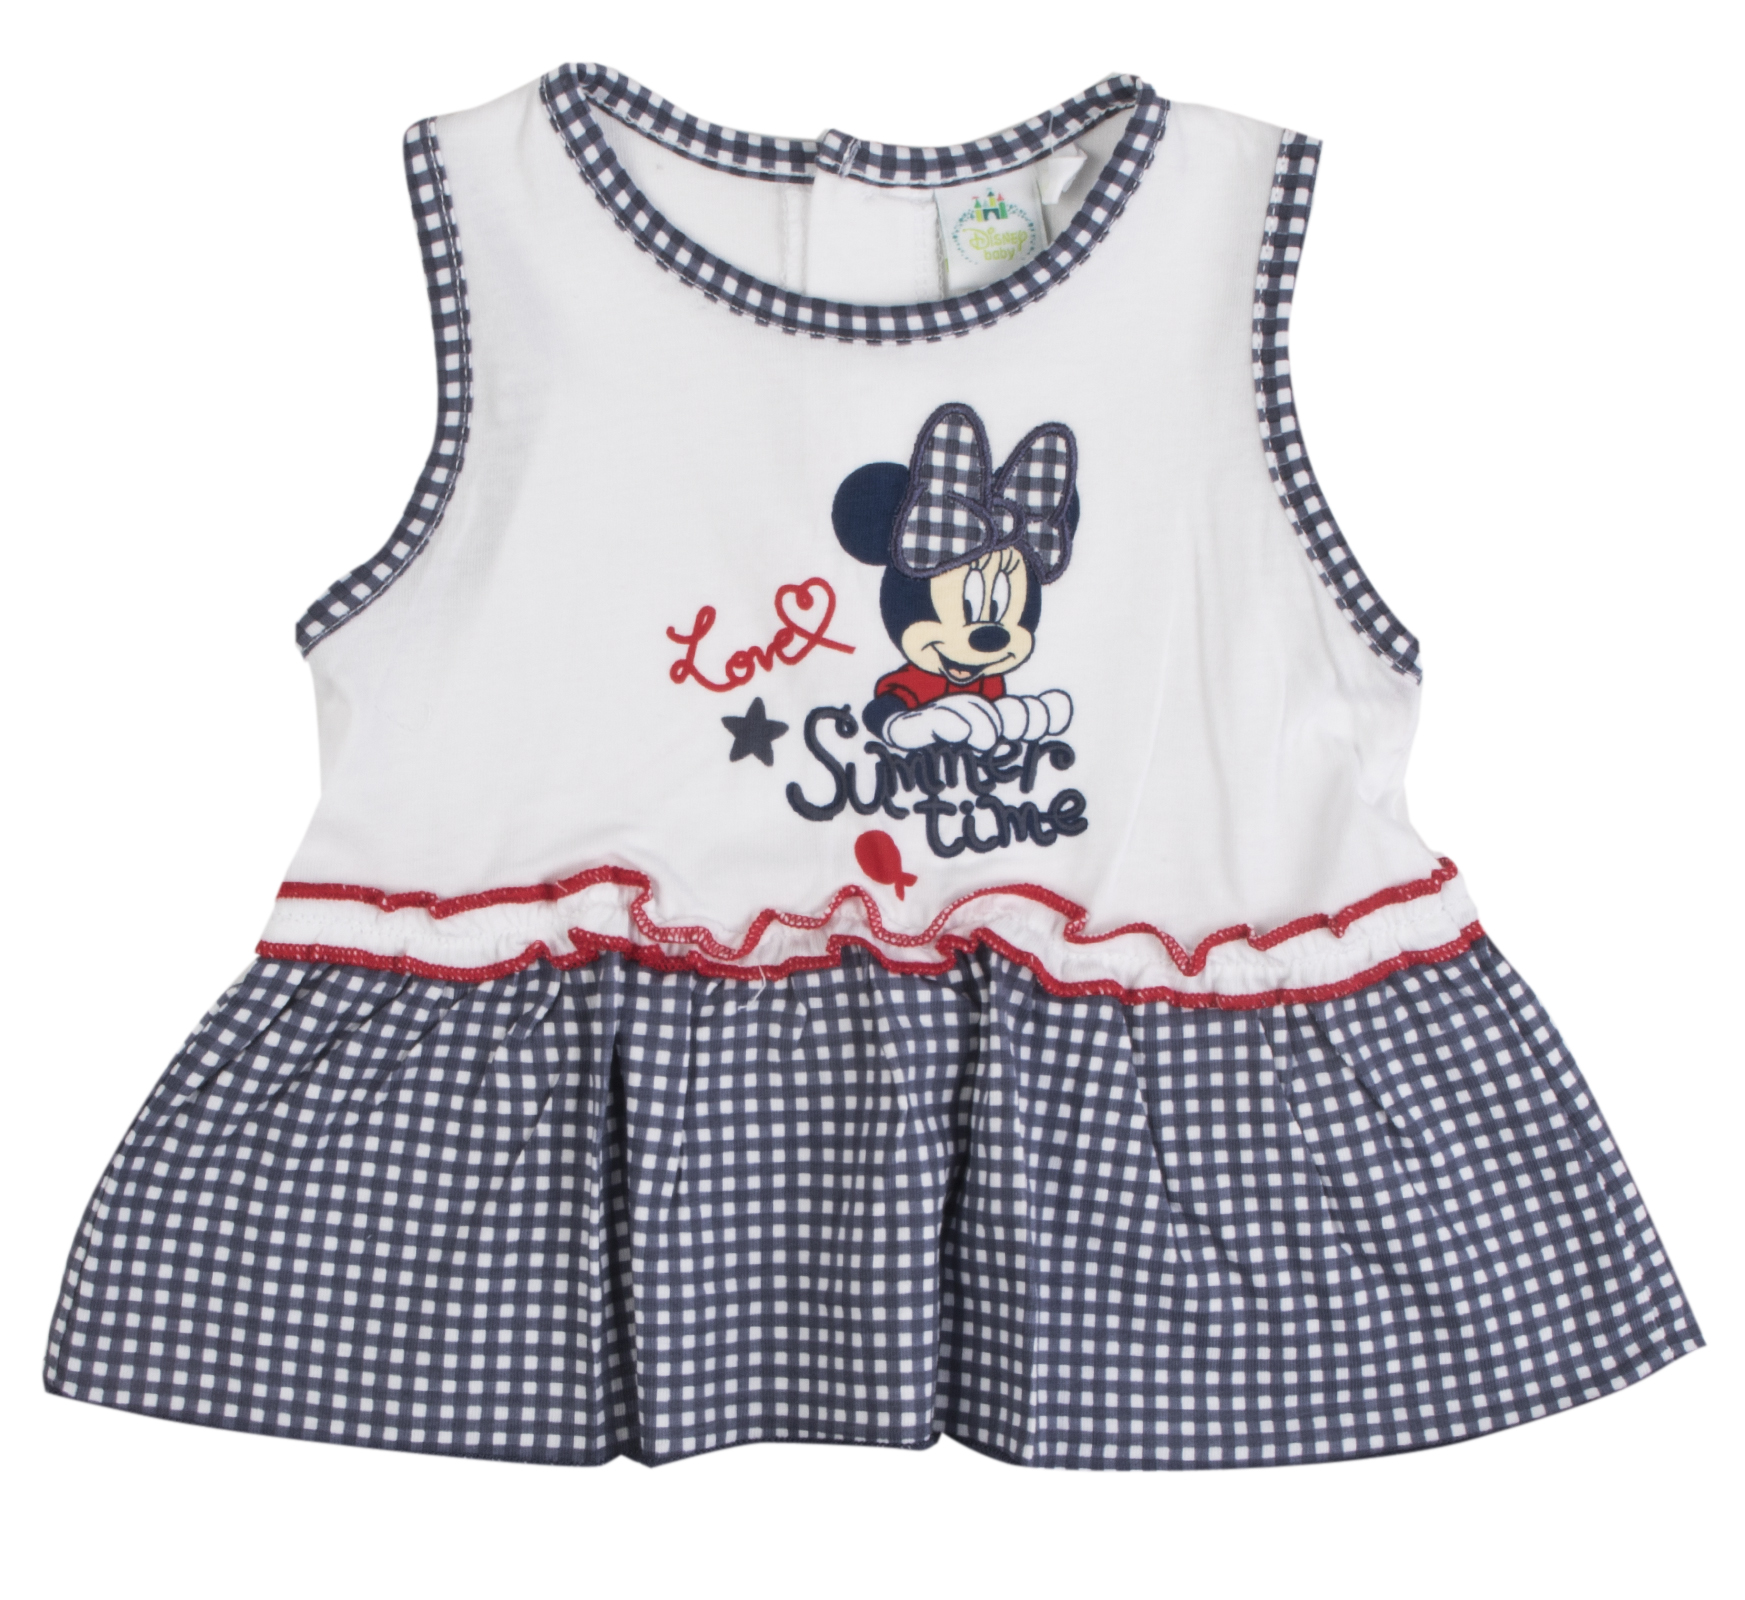 1afec0b1c Disney Minnie Mouse Outfit 3 Piece Set Dress Leggings + Cardigan ...